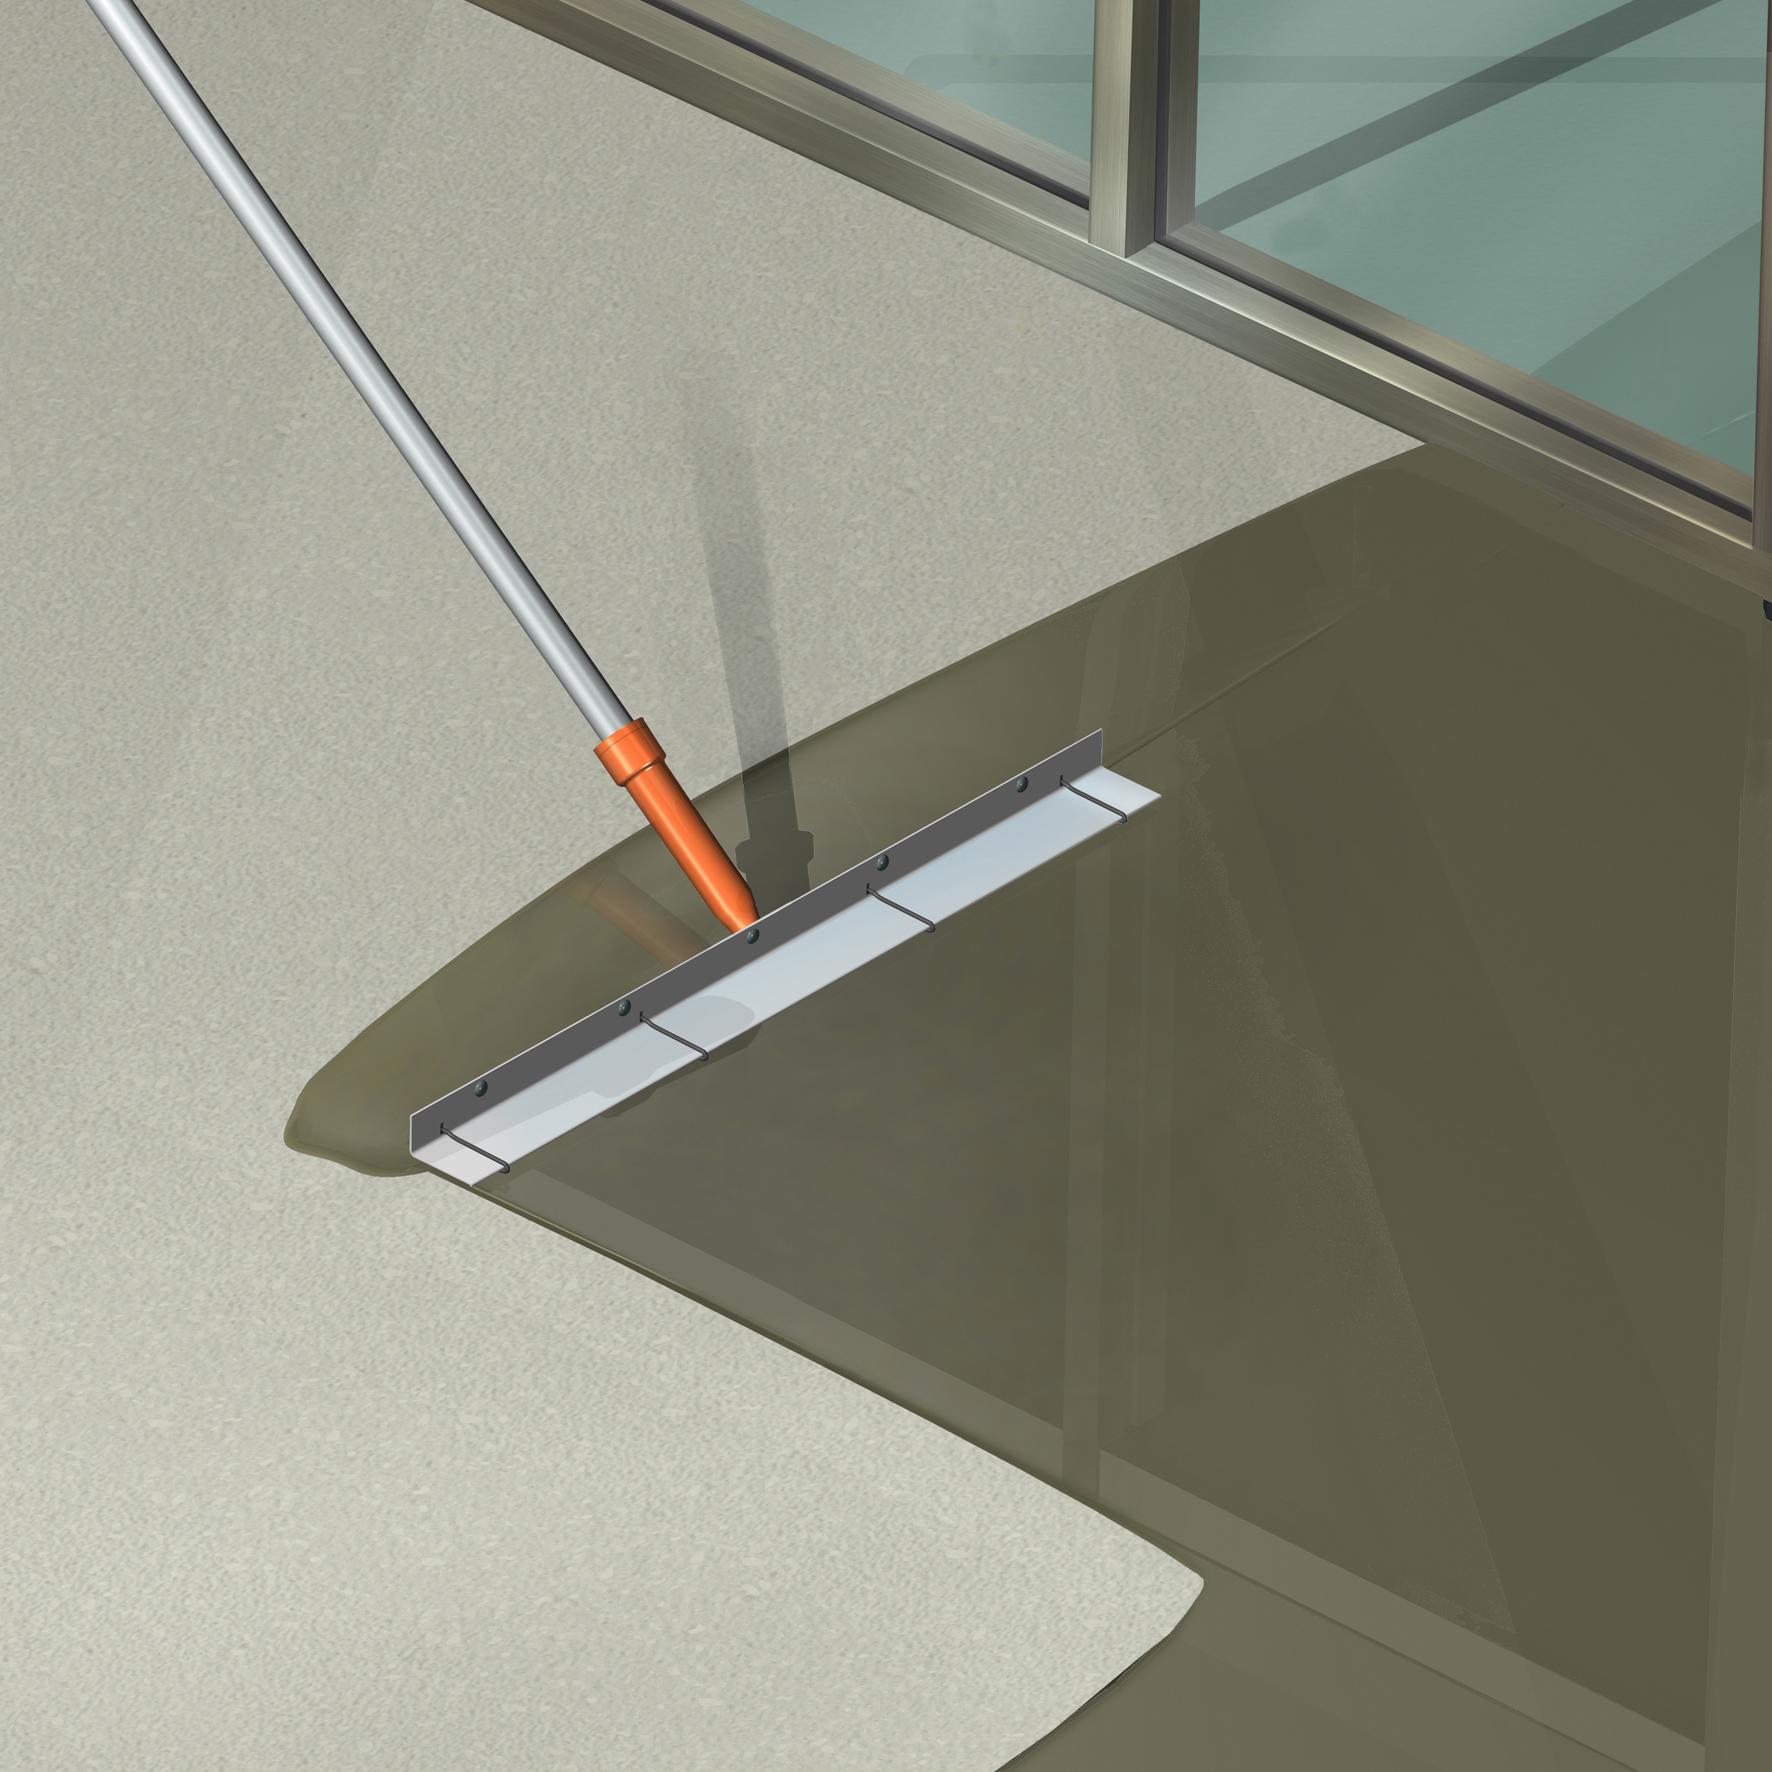 Sapa autonivelanta pe baza de ciment cu intarire rapida - Produs si aplicare SIKA - Poza 4